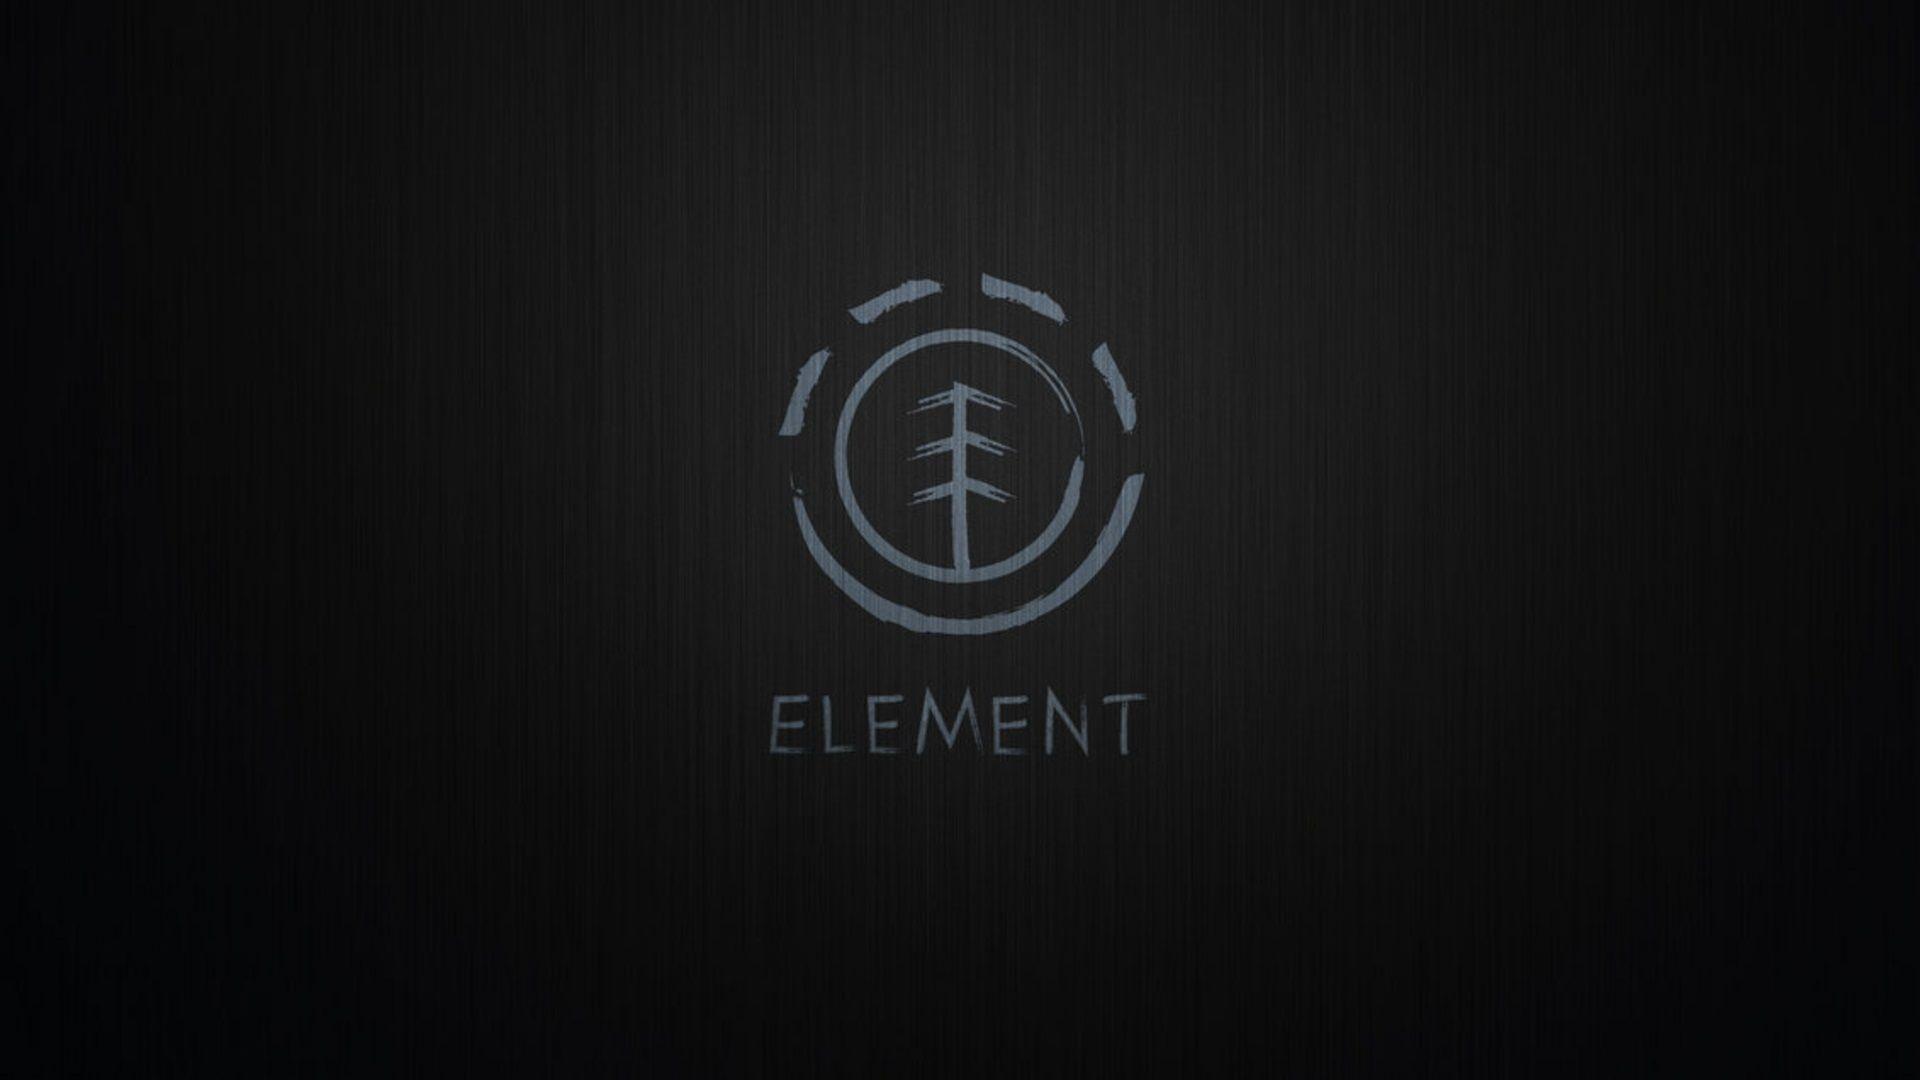 Element Skateboards Wallpaper (1920x1080)